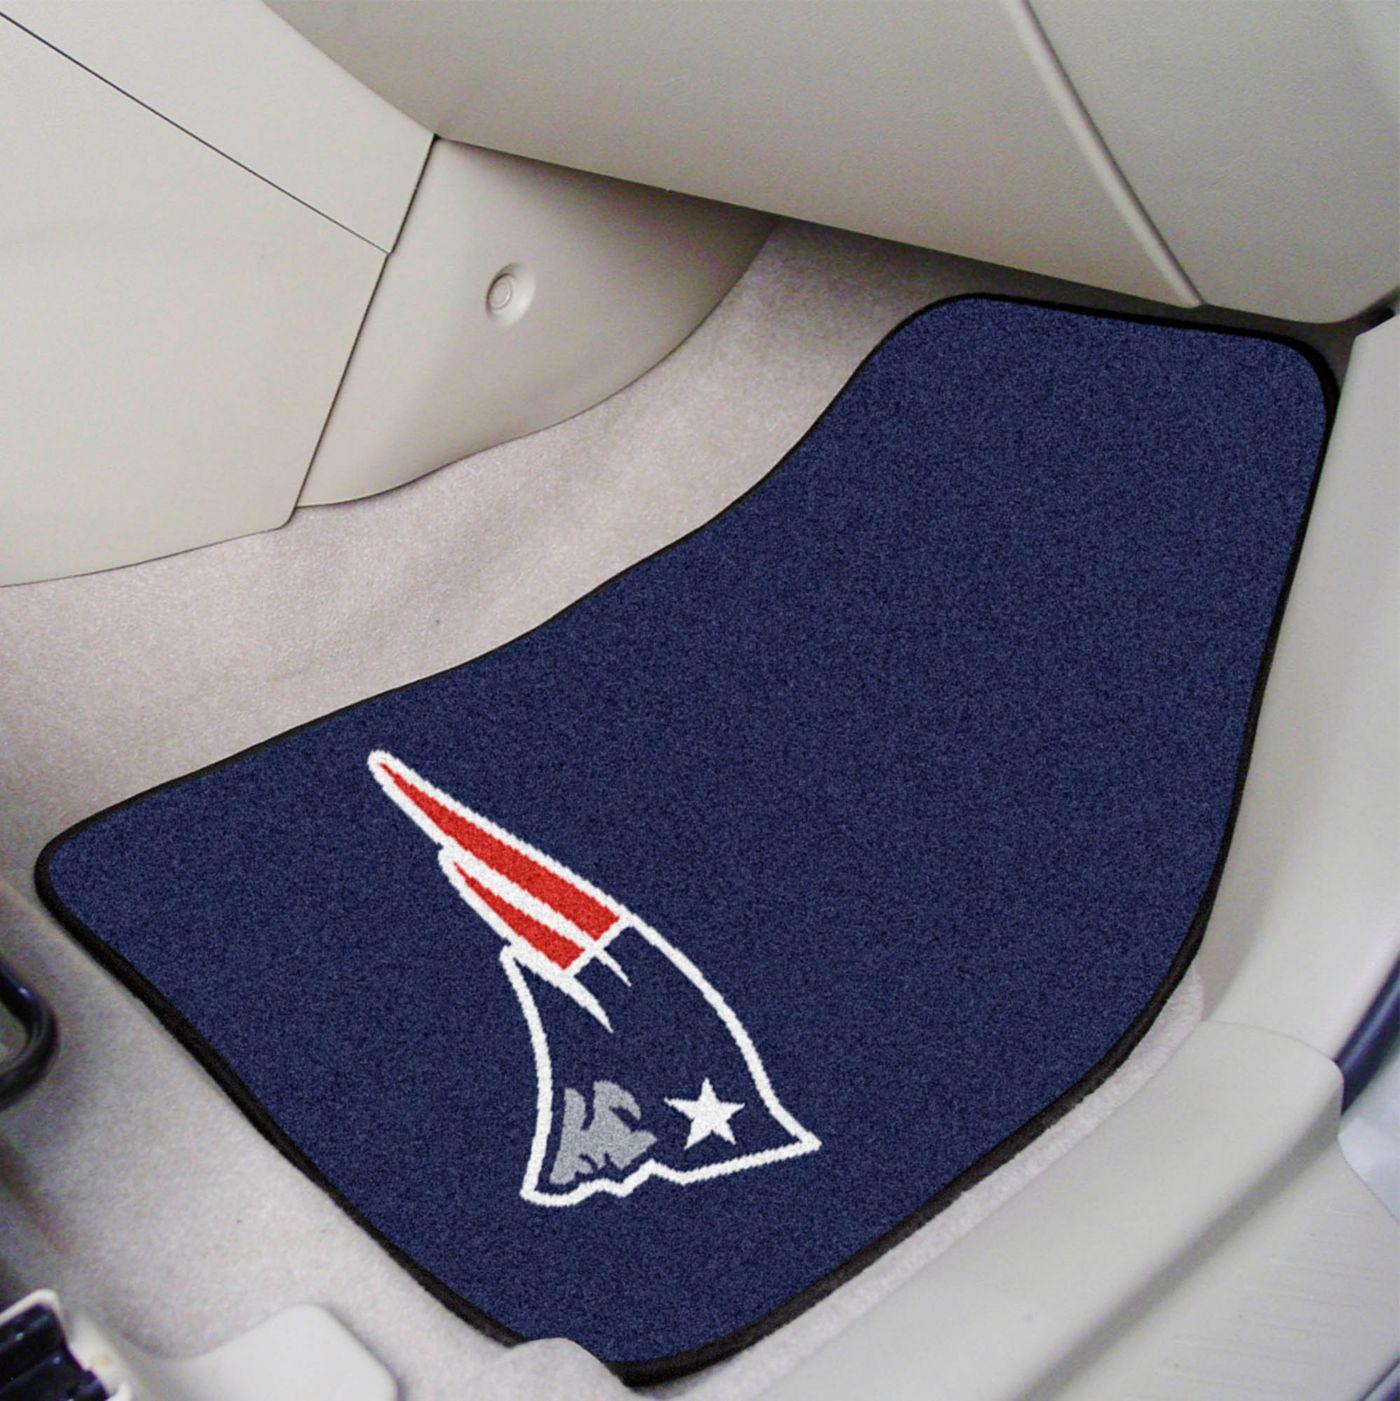 FANMATS New England Patriots 2-Piece Printed Carpet Car Mat Set